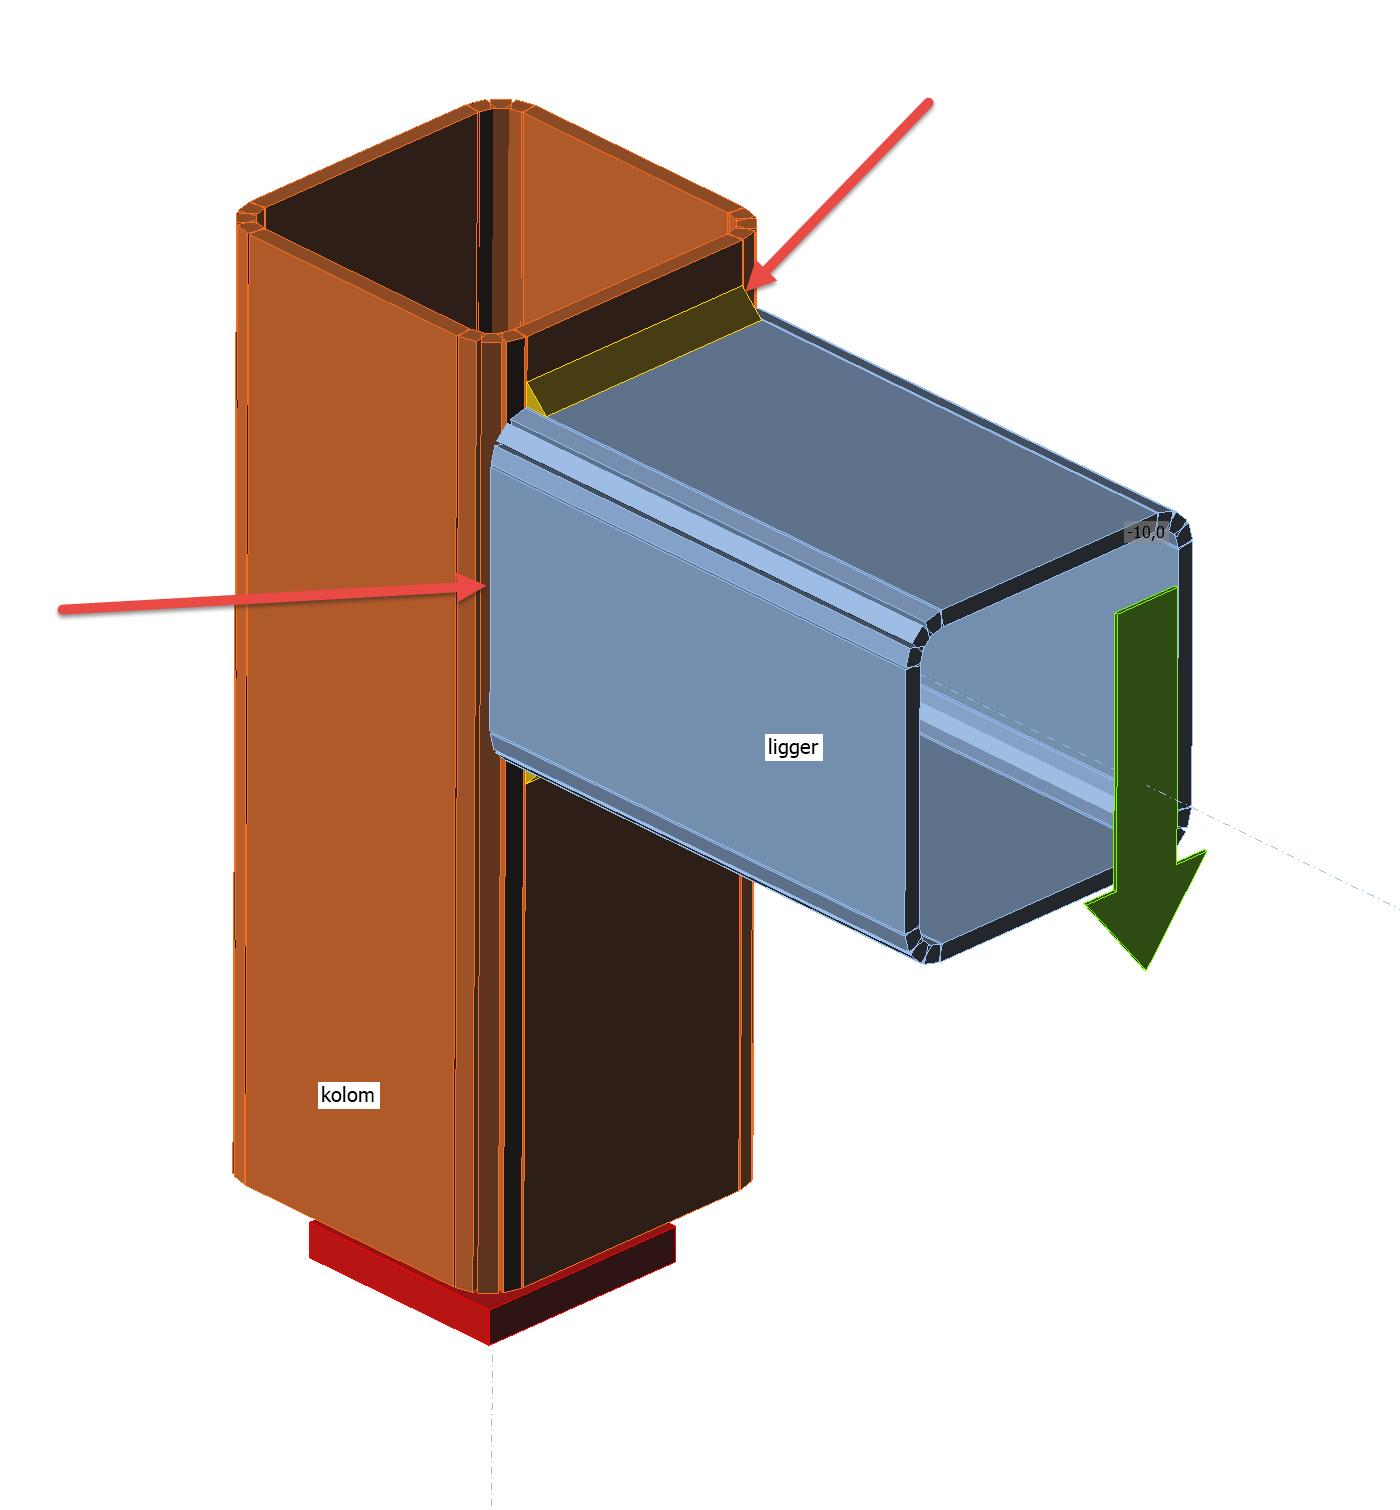 vierkante kokers lassen in IDEA Connection